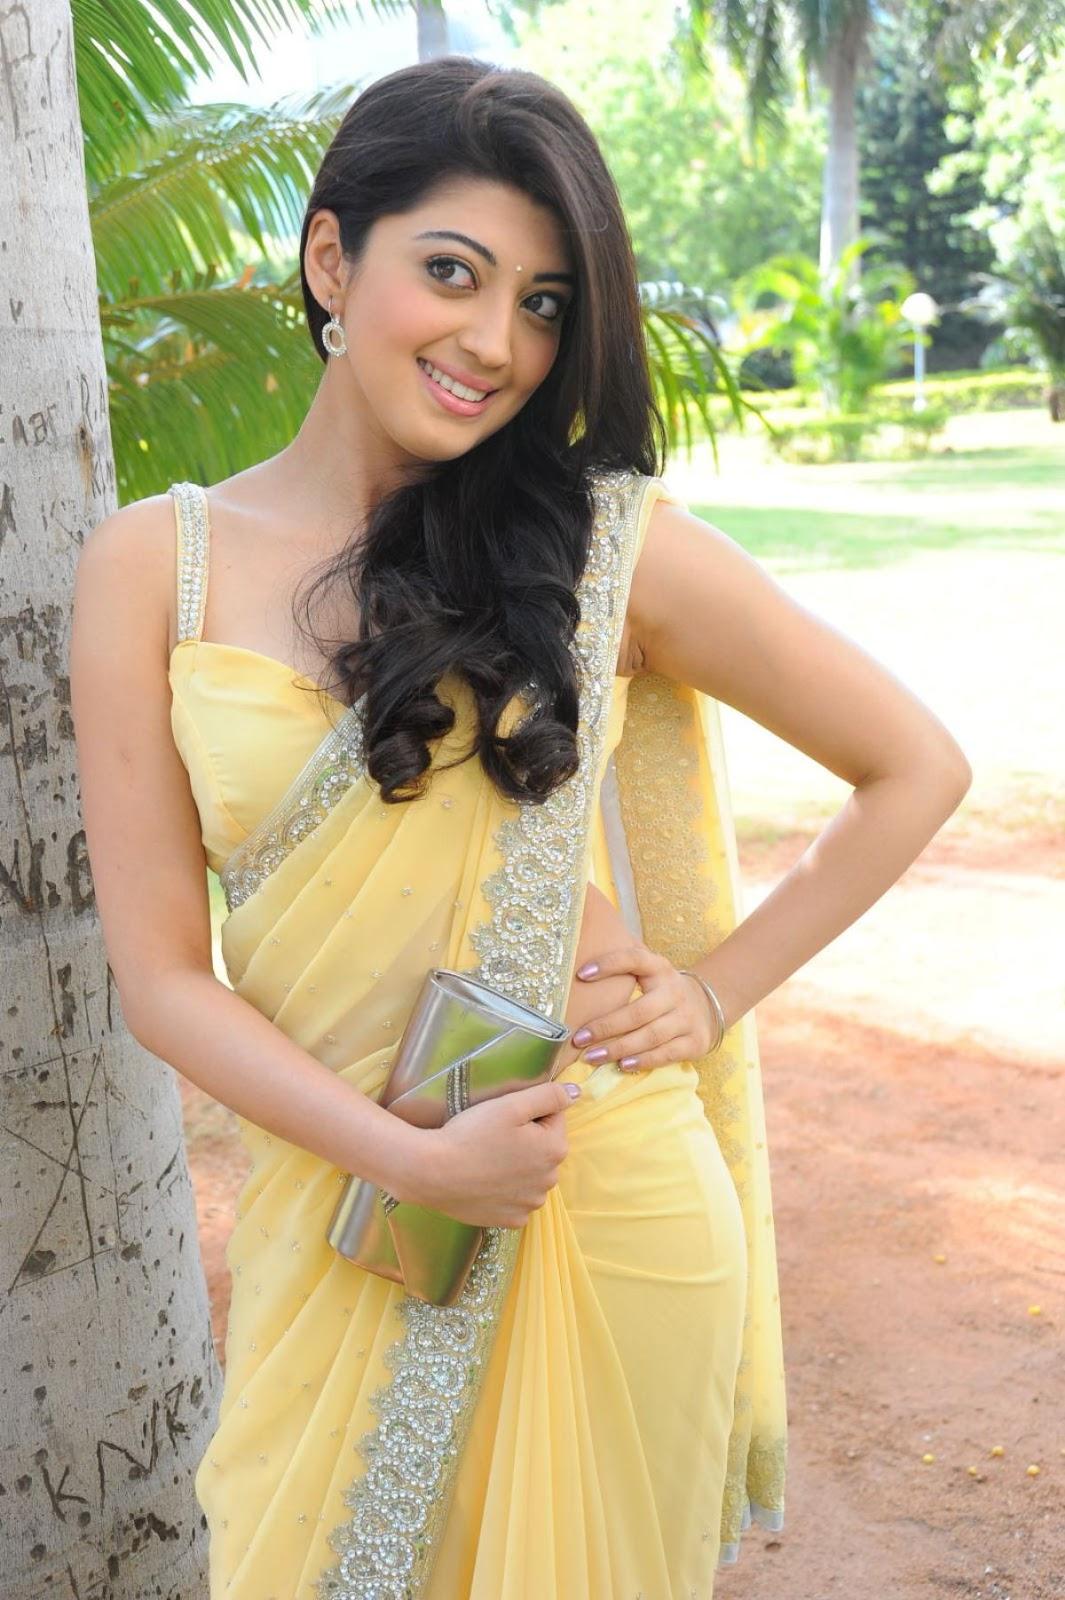 Cute pranitha in a yellow saree